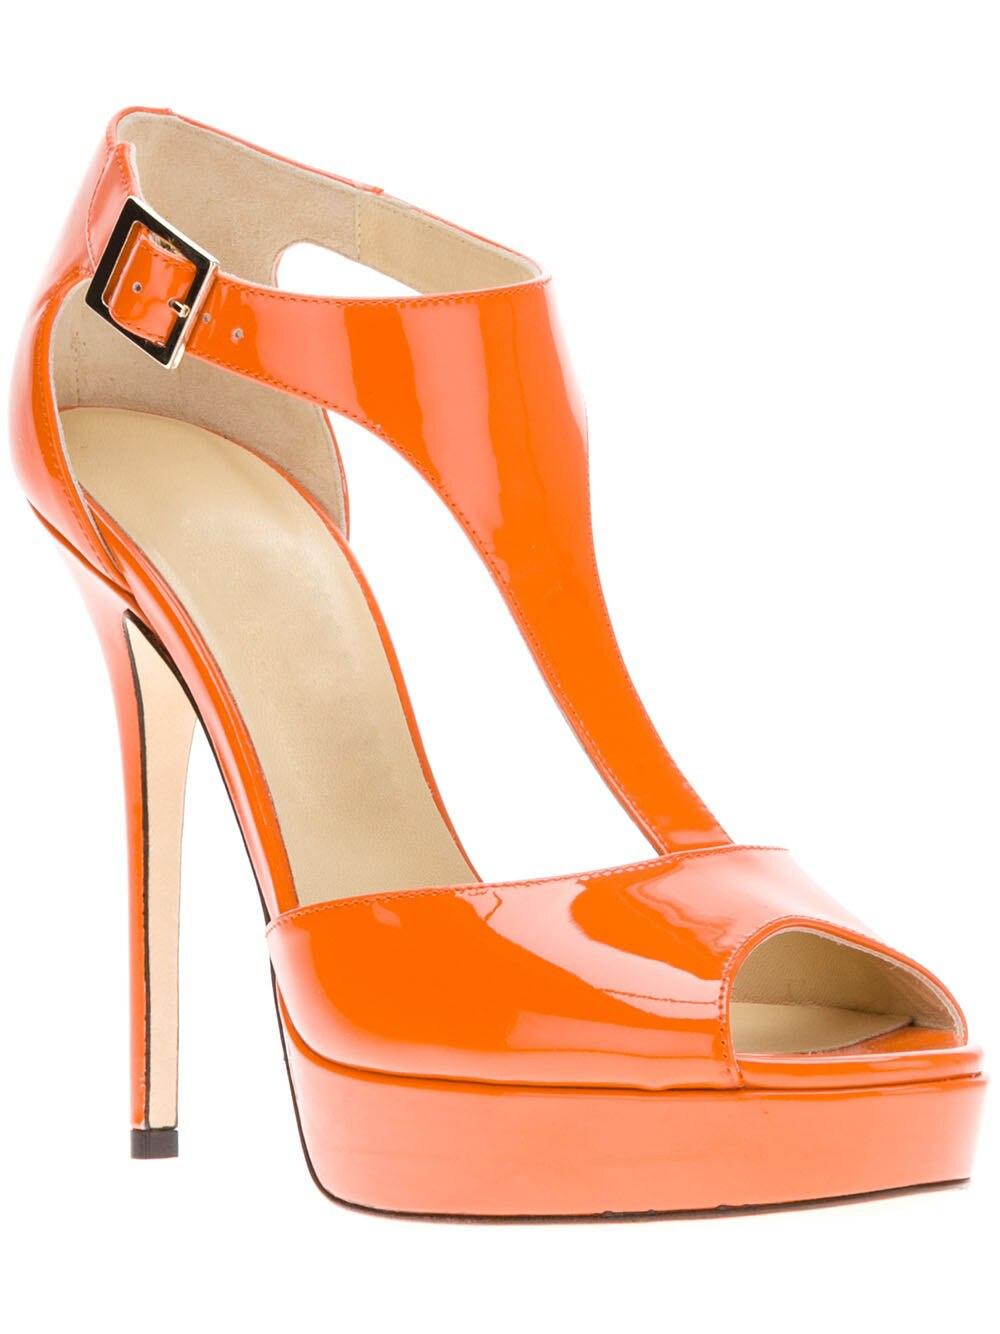 ФОТО Orange Patent Leather Platform T-strap Women Sandal Open Toe Made-to-order Plus Size 14 Ladies Shoes With Heel Platform